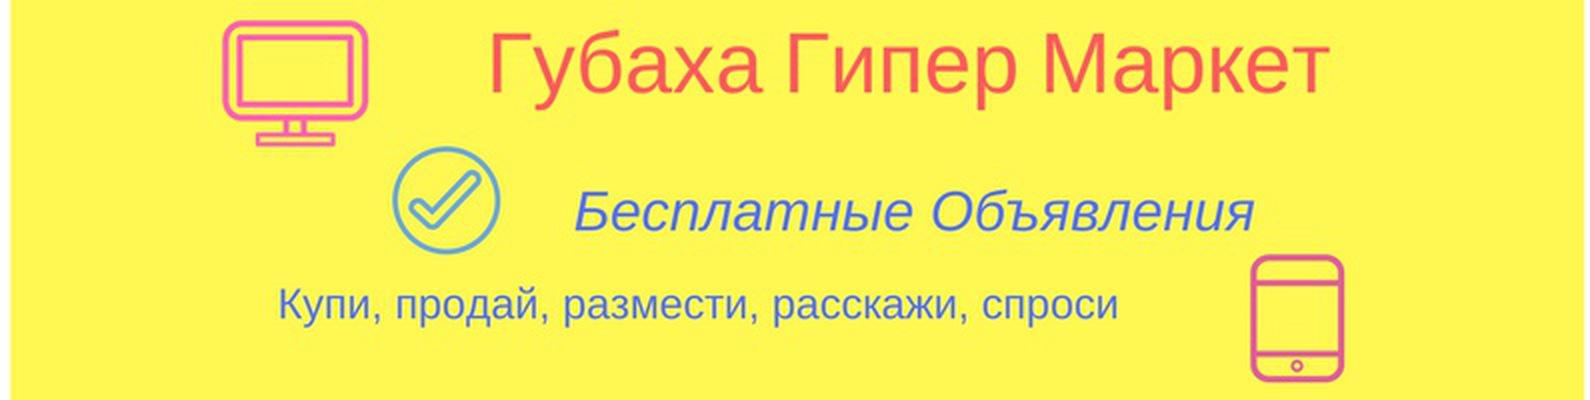 Губаха Гипер Маркет   ВКонтакте 7257a2fe6b9